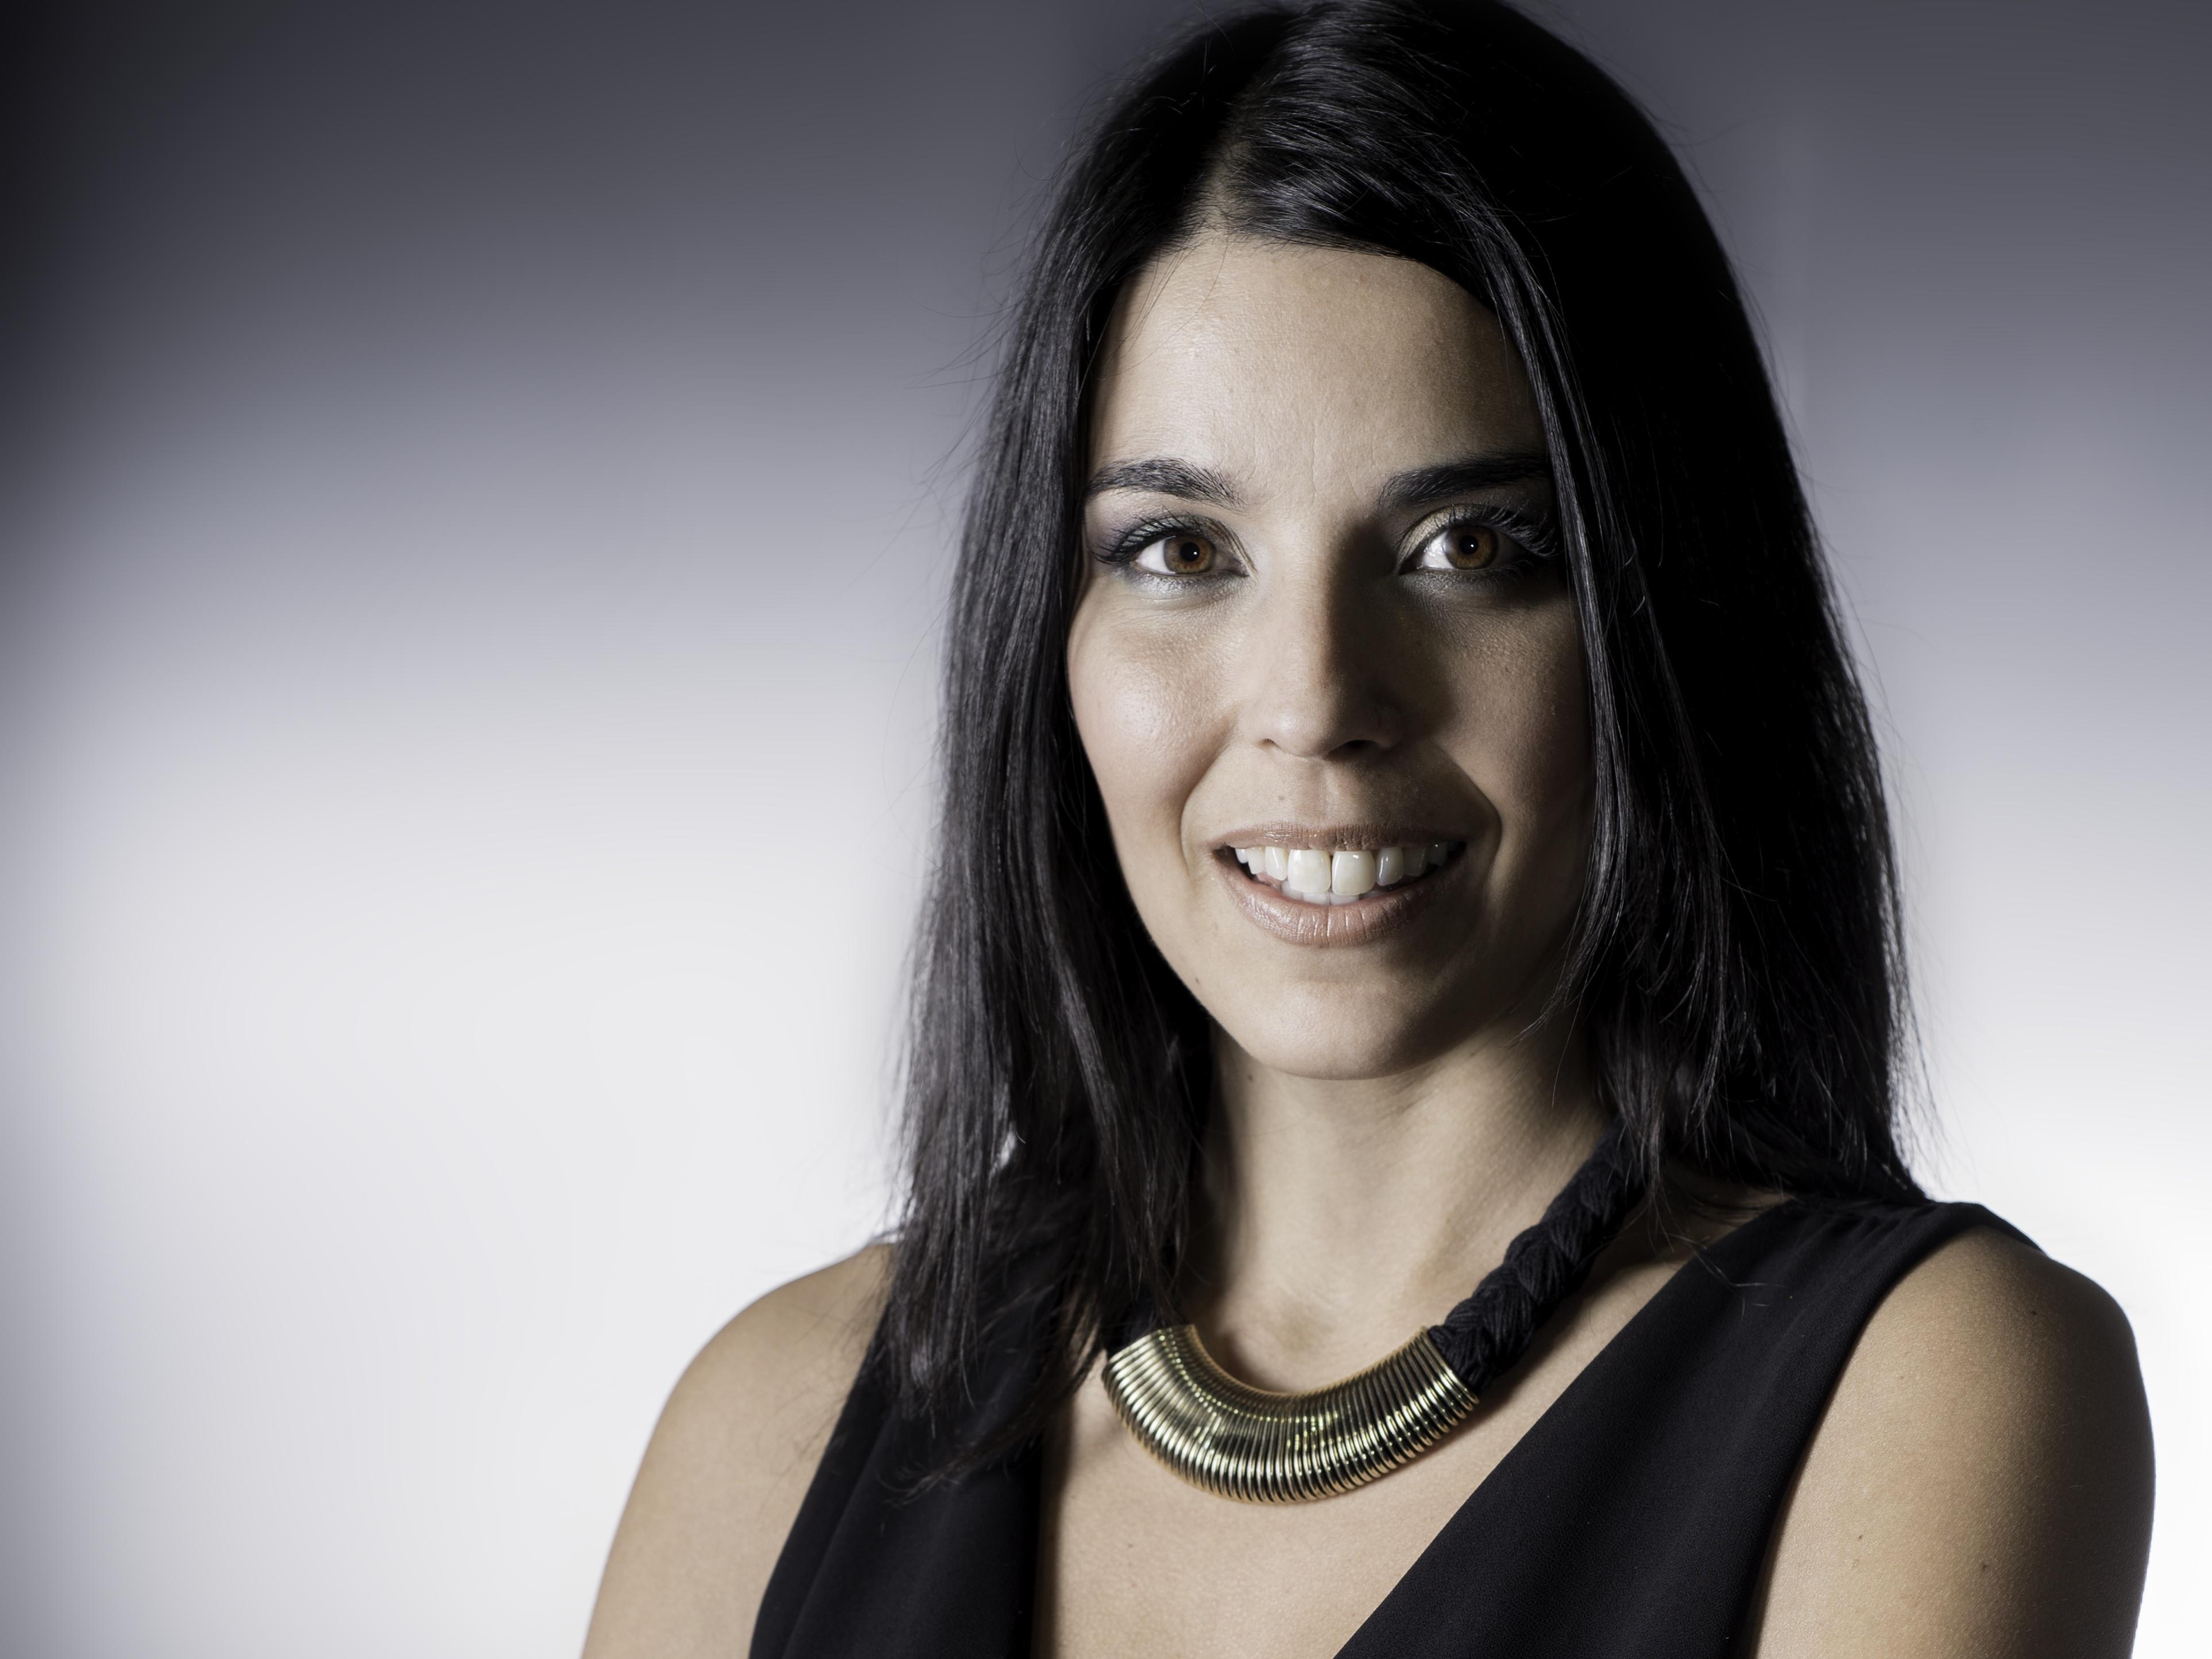 Elisa Padoan, direttore di Reteconomy